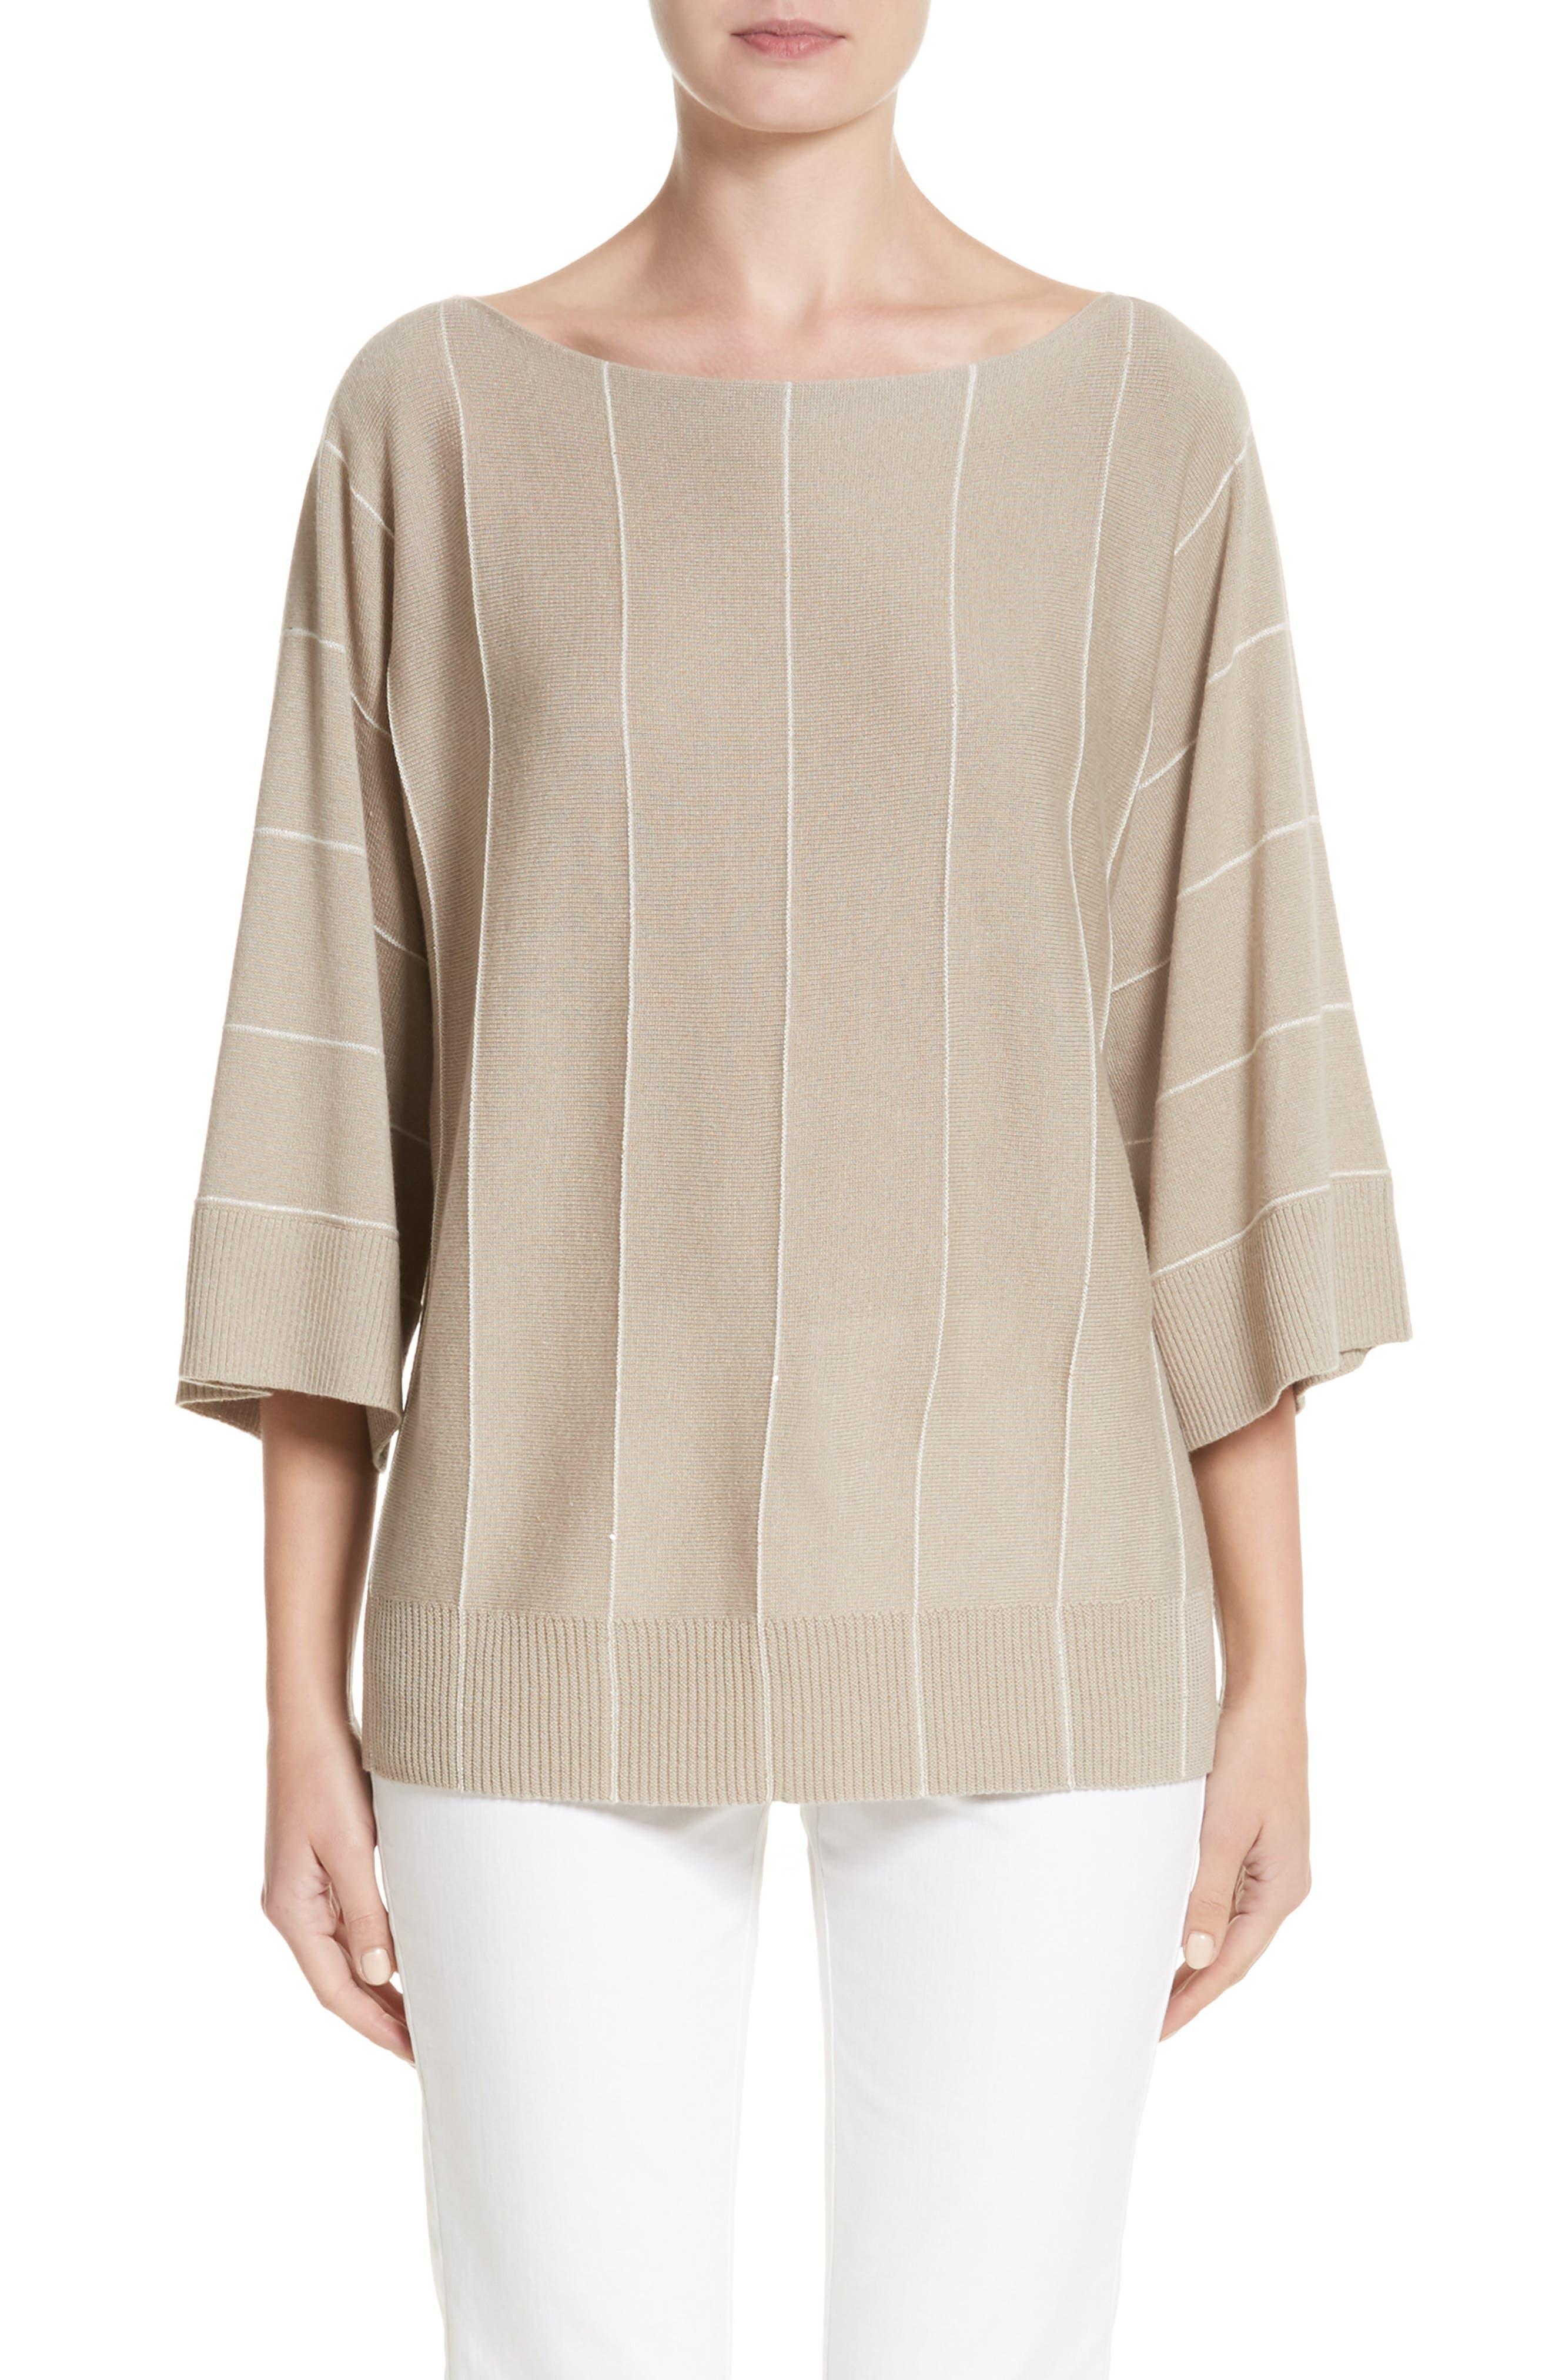 Sequin Knit Cashmere & Silk Pullover,                             Main thumbnail 1, color,                             Khaki Multi